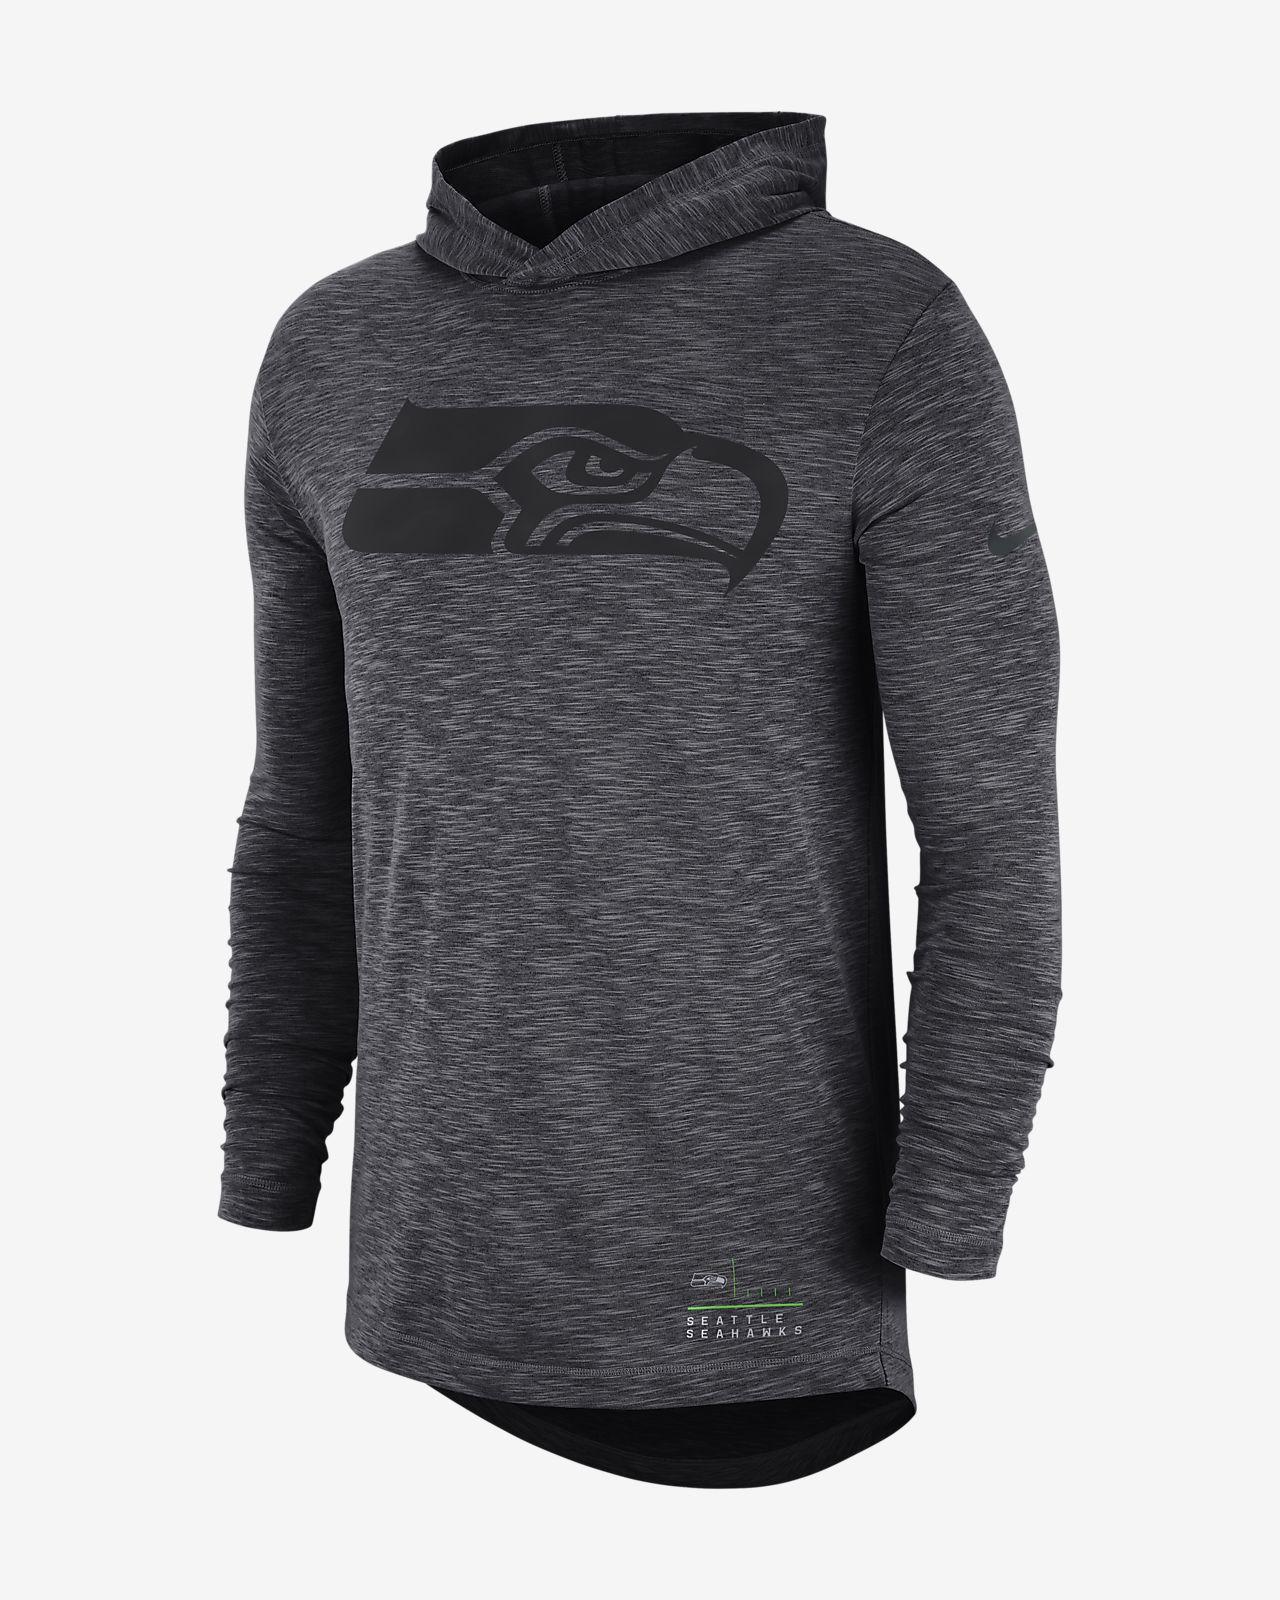 Custom Nike Dri Fit Long Sleeve Shirts Rldm